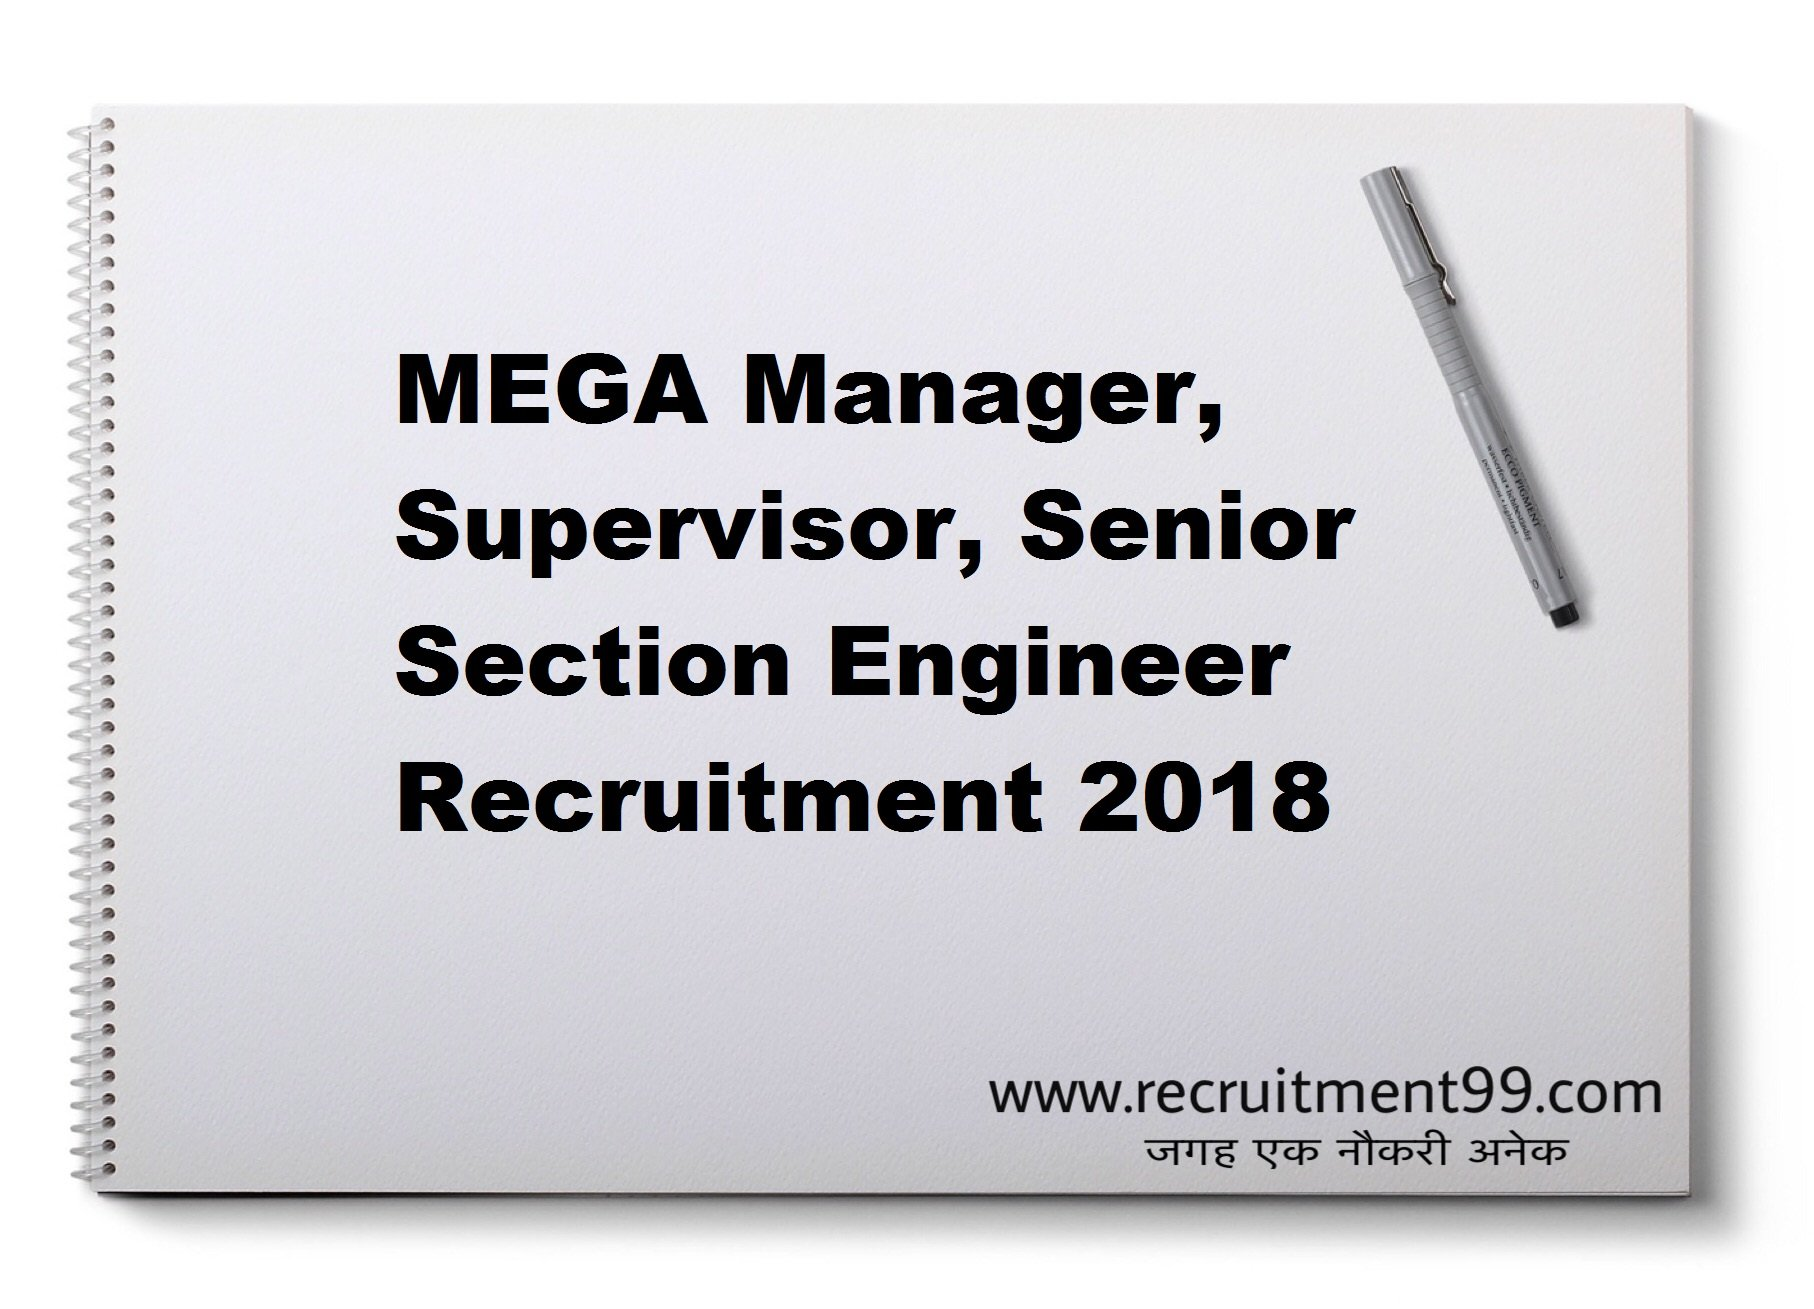 MEGA Manager Supervisor Senior Section Engineer Recruitment Admit Card Result 2018